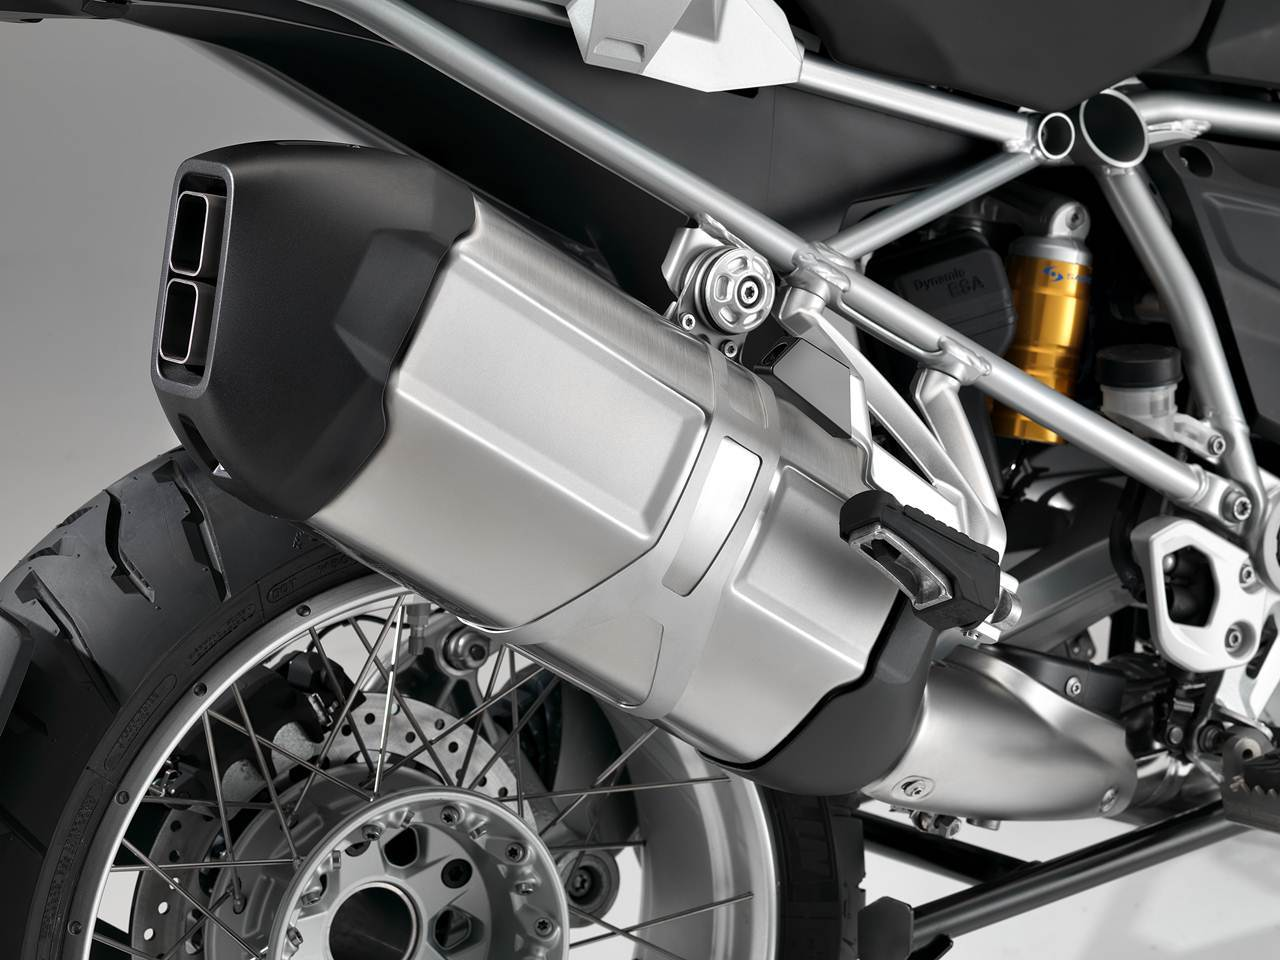 Foto de BMW R1200GS 2013, detalles (13/44)